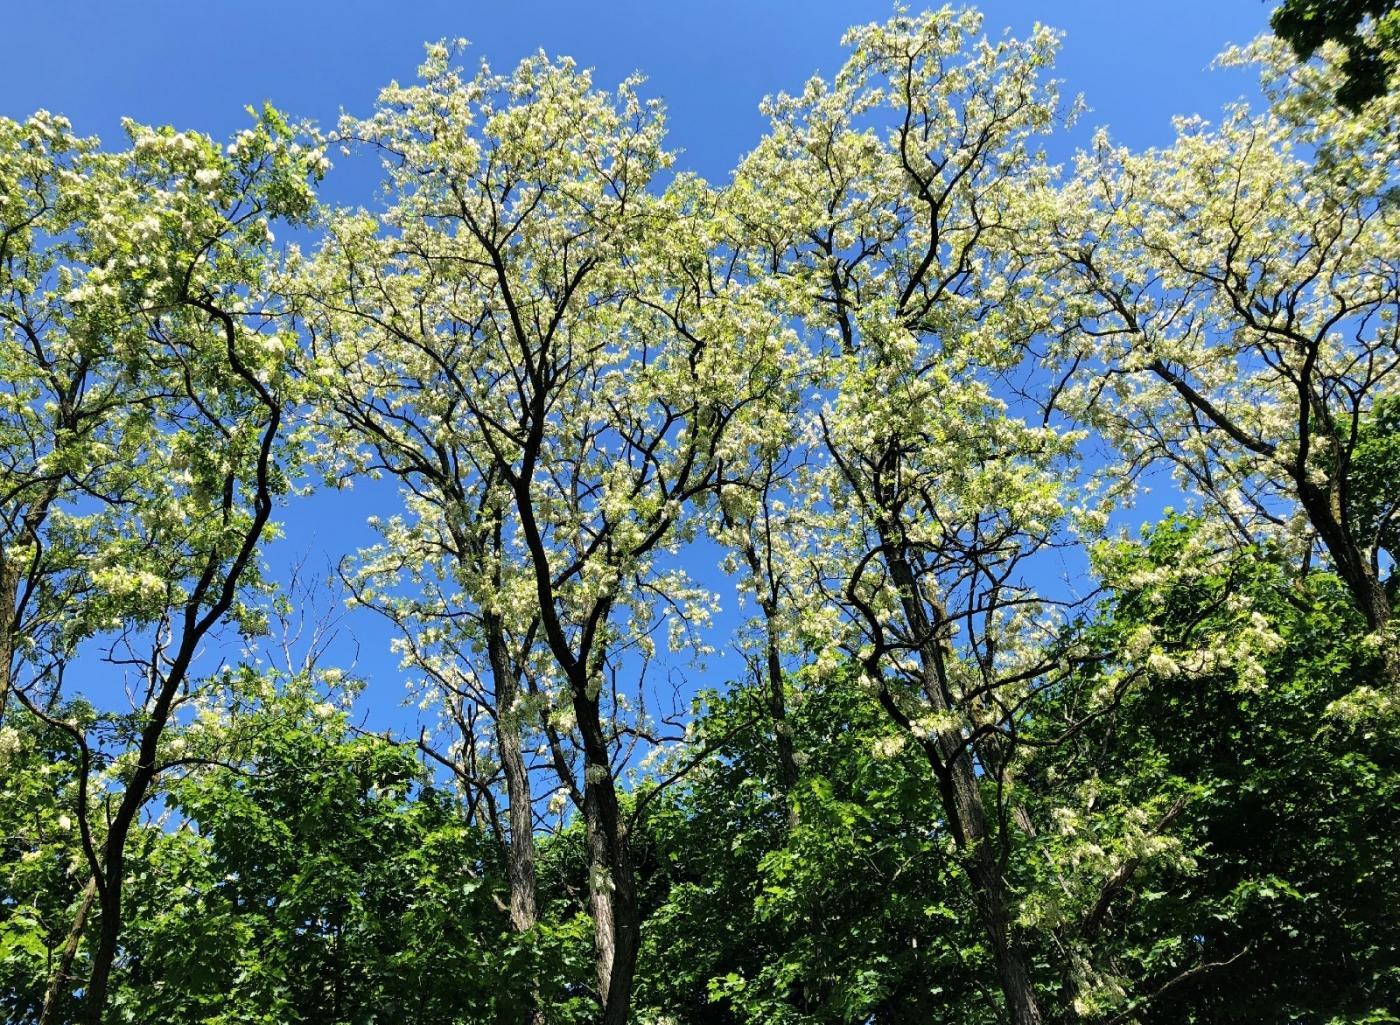 【田螺随拍】美国黄杨american yellowwood_图1-4